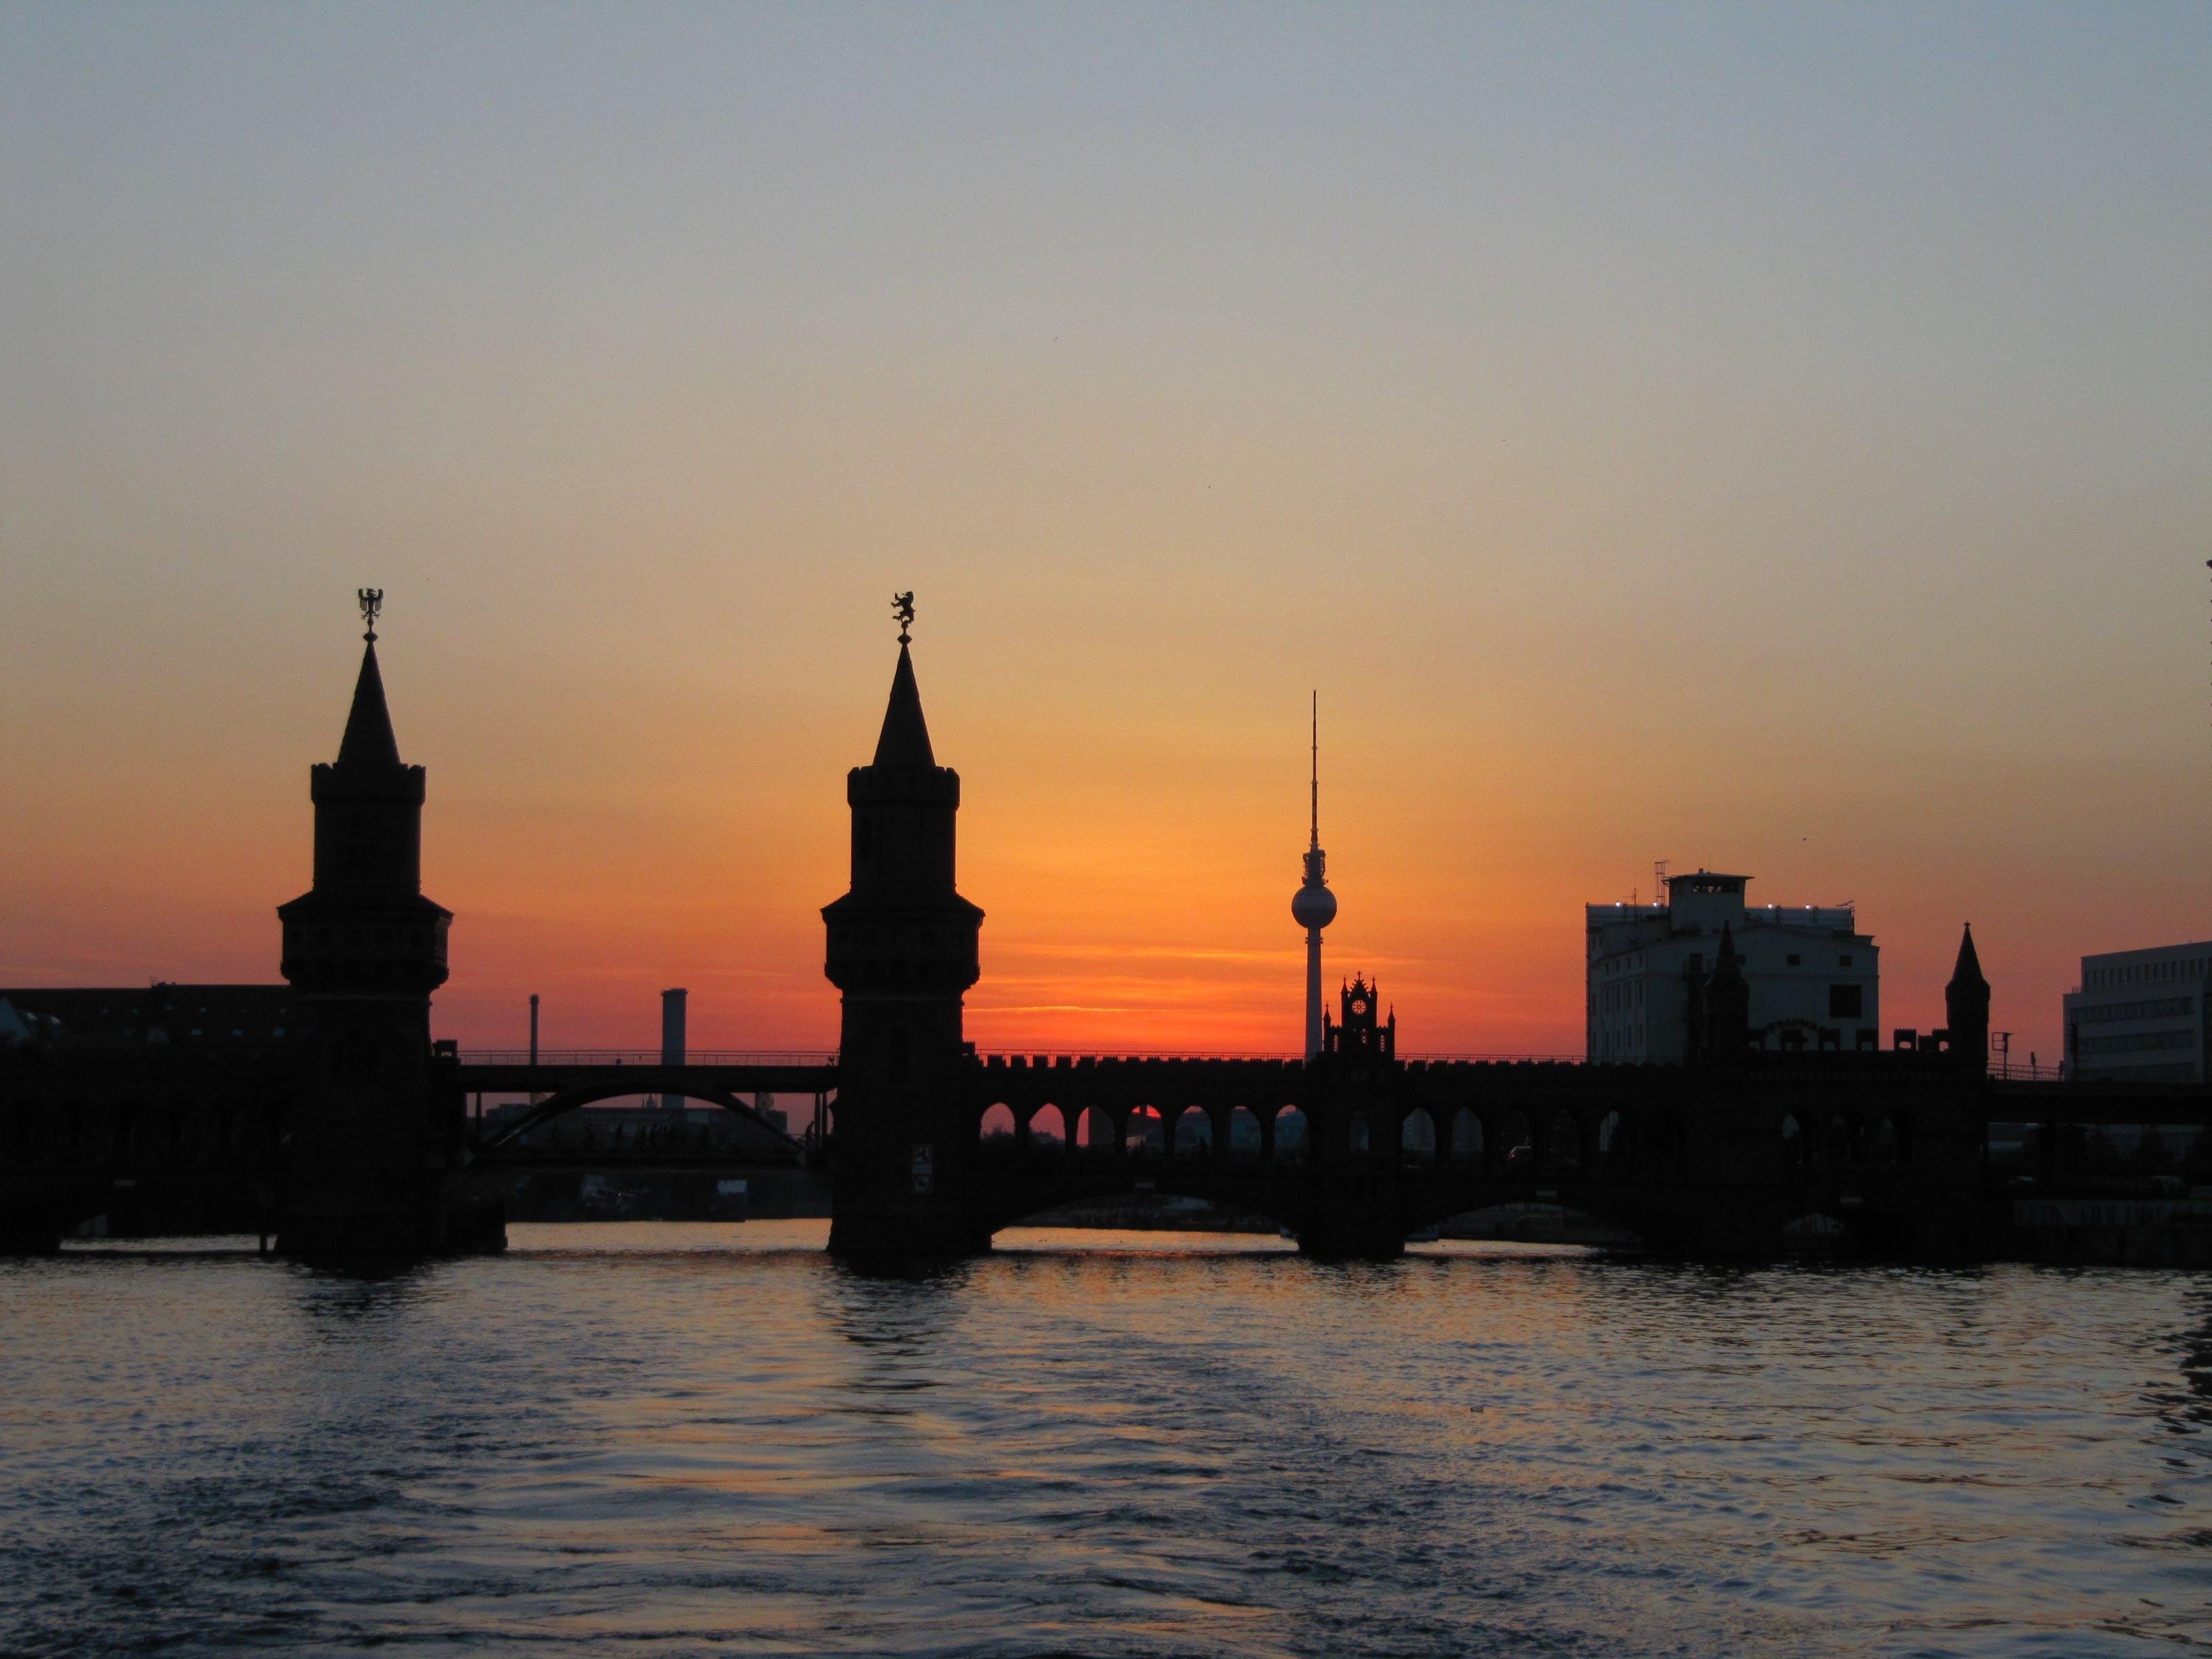 aften, arkitektur, berlin